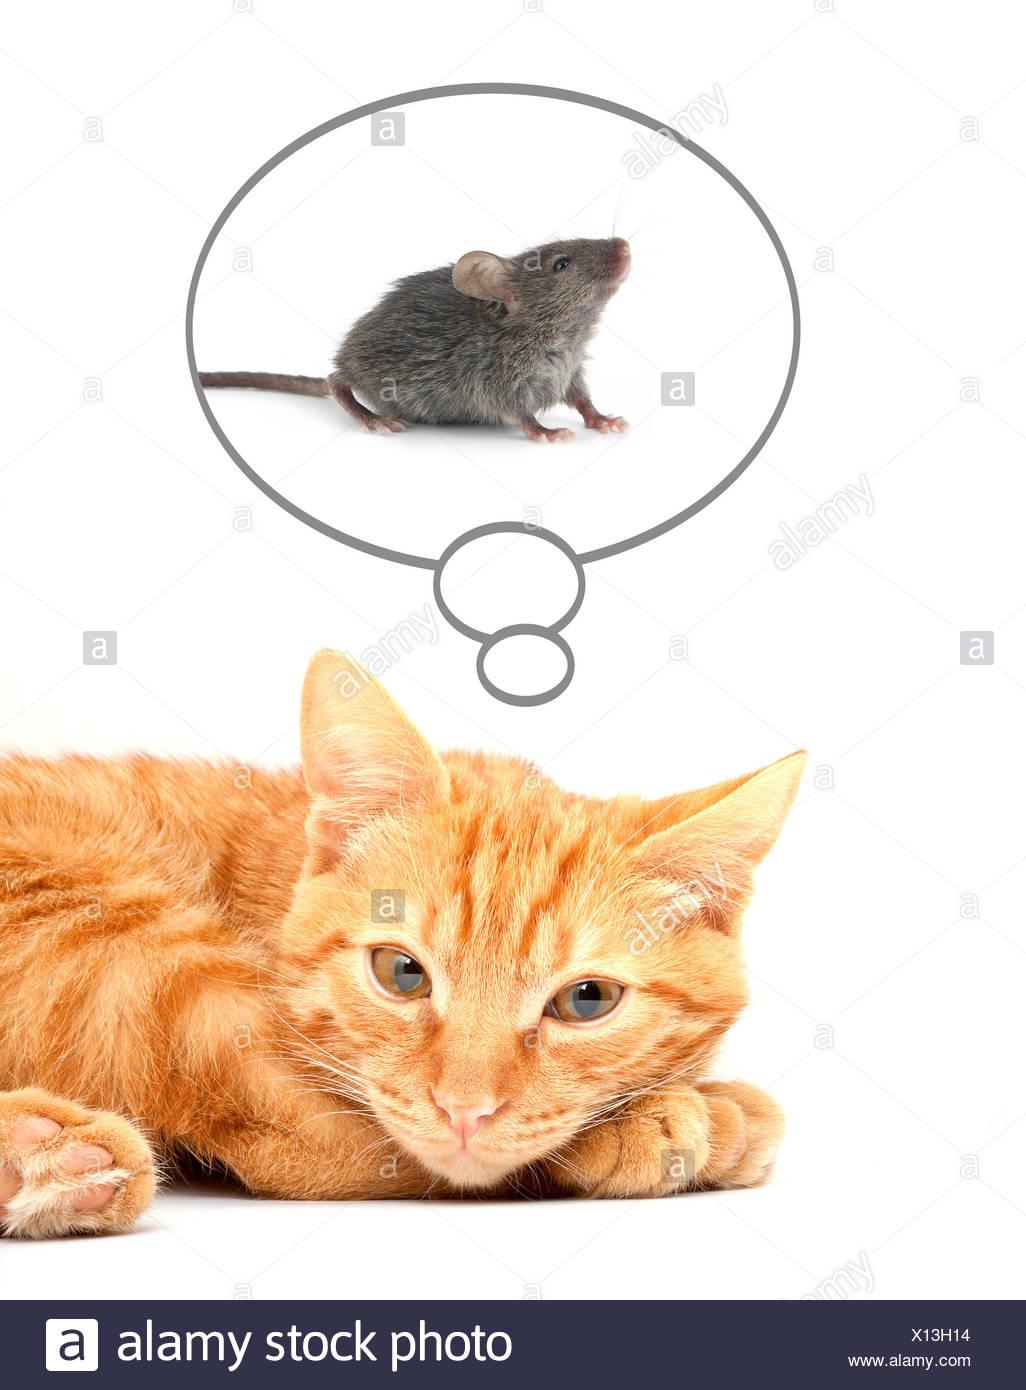 Cat - Stock Image